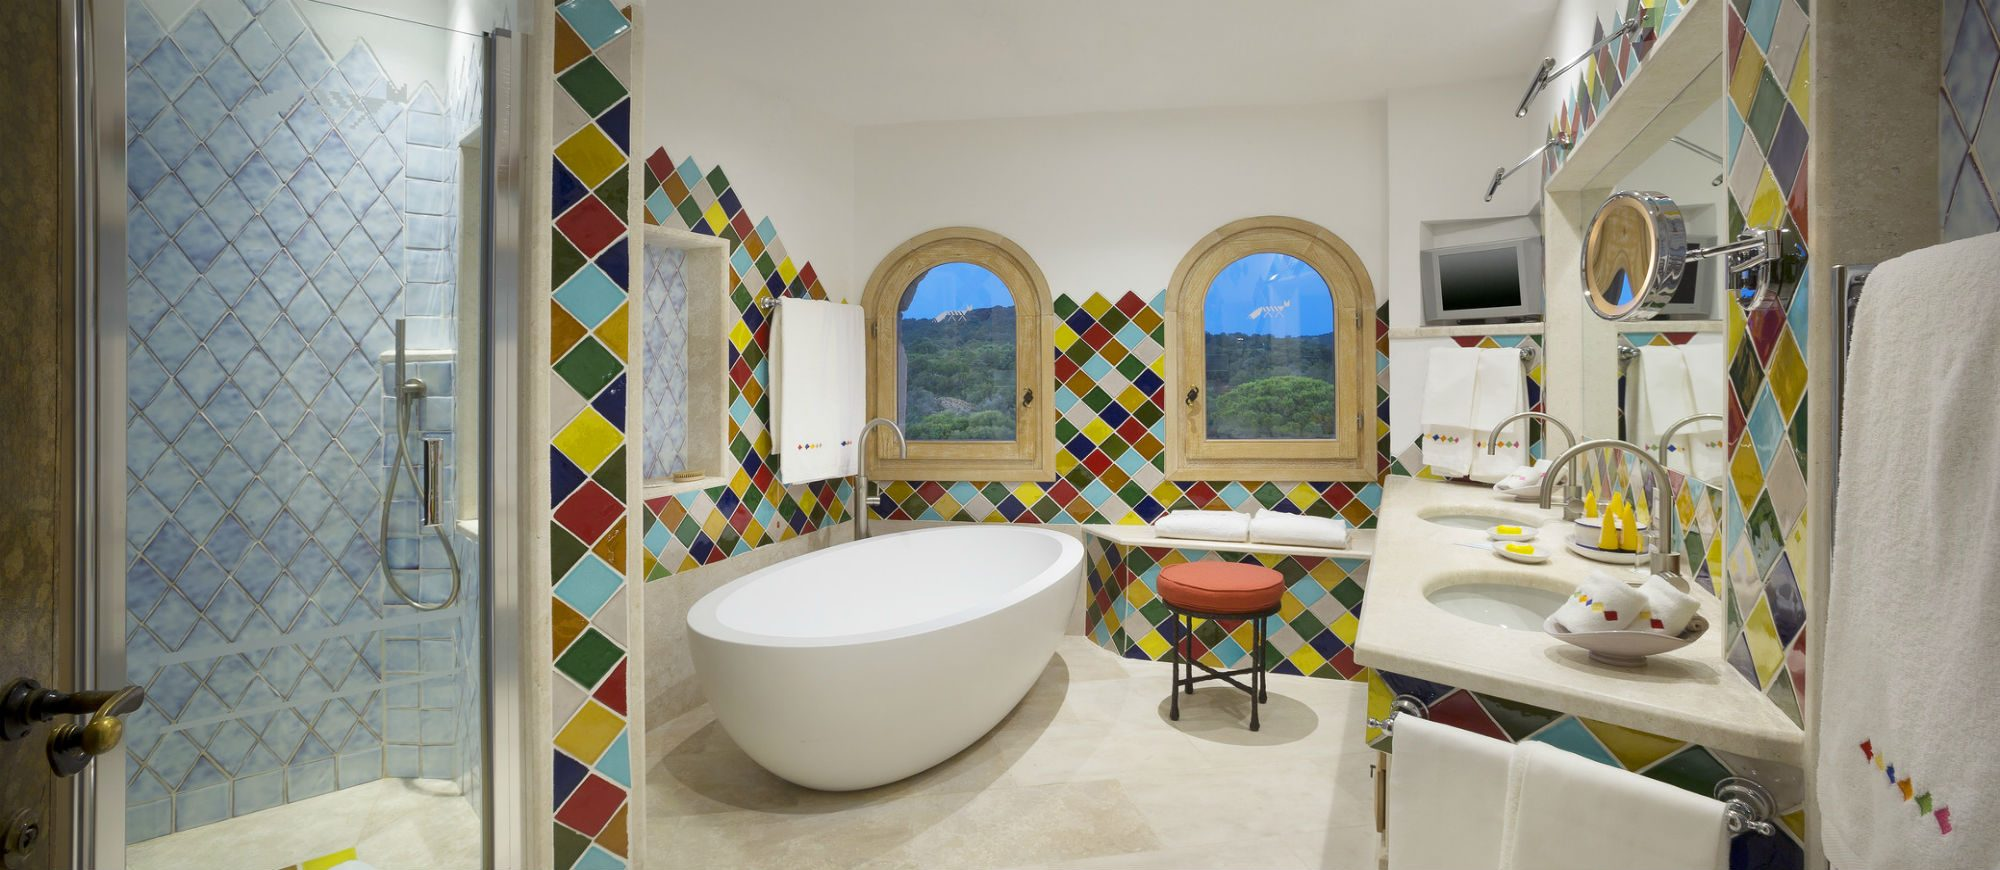 pent-main1-lux59gb-155338-penthouse-suite-bathroom